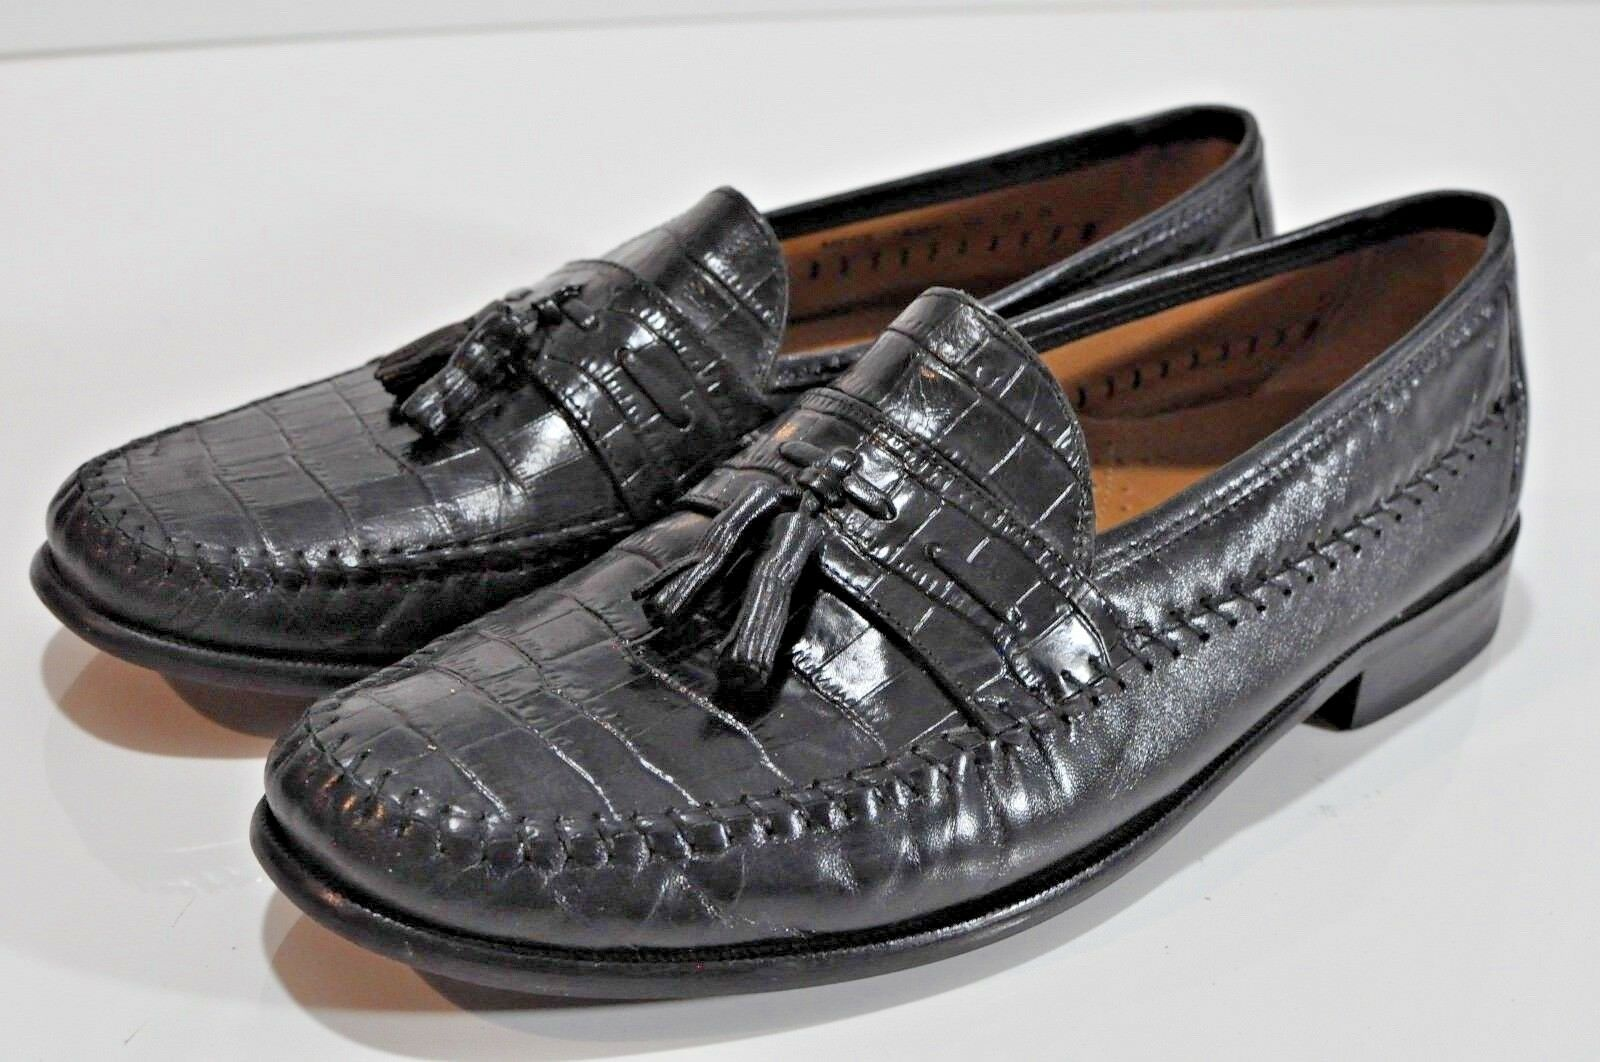 Florsheim Mens slip on tassel loafers size 12